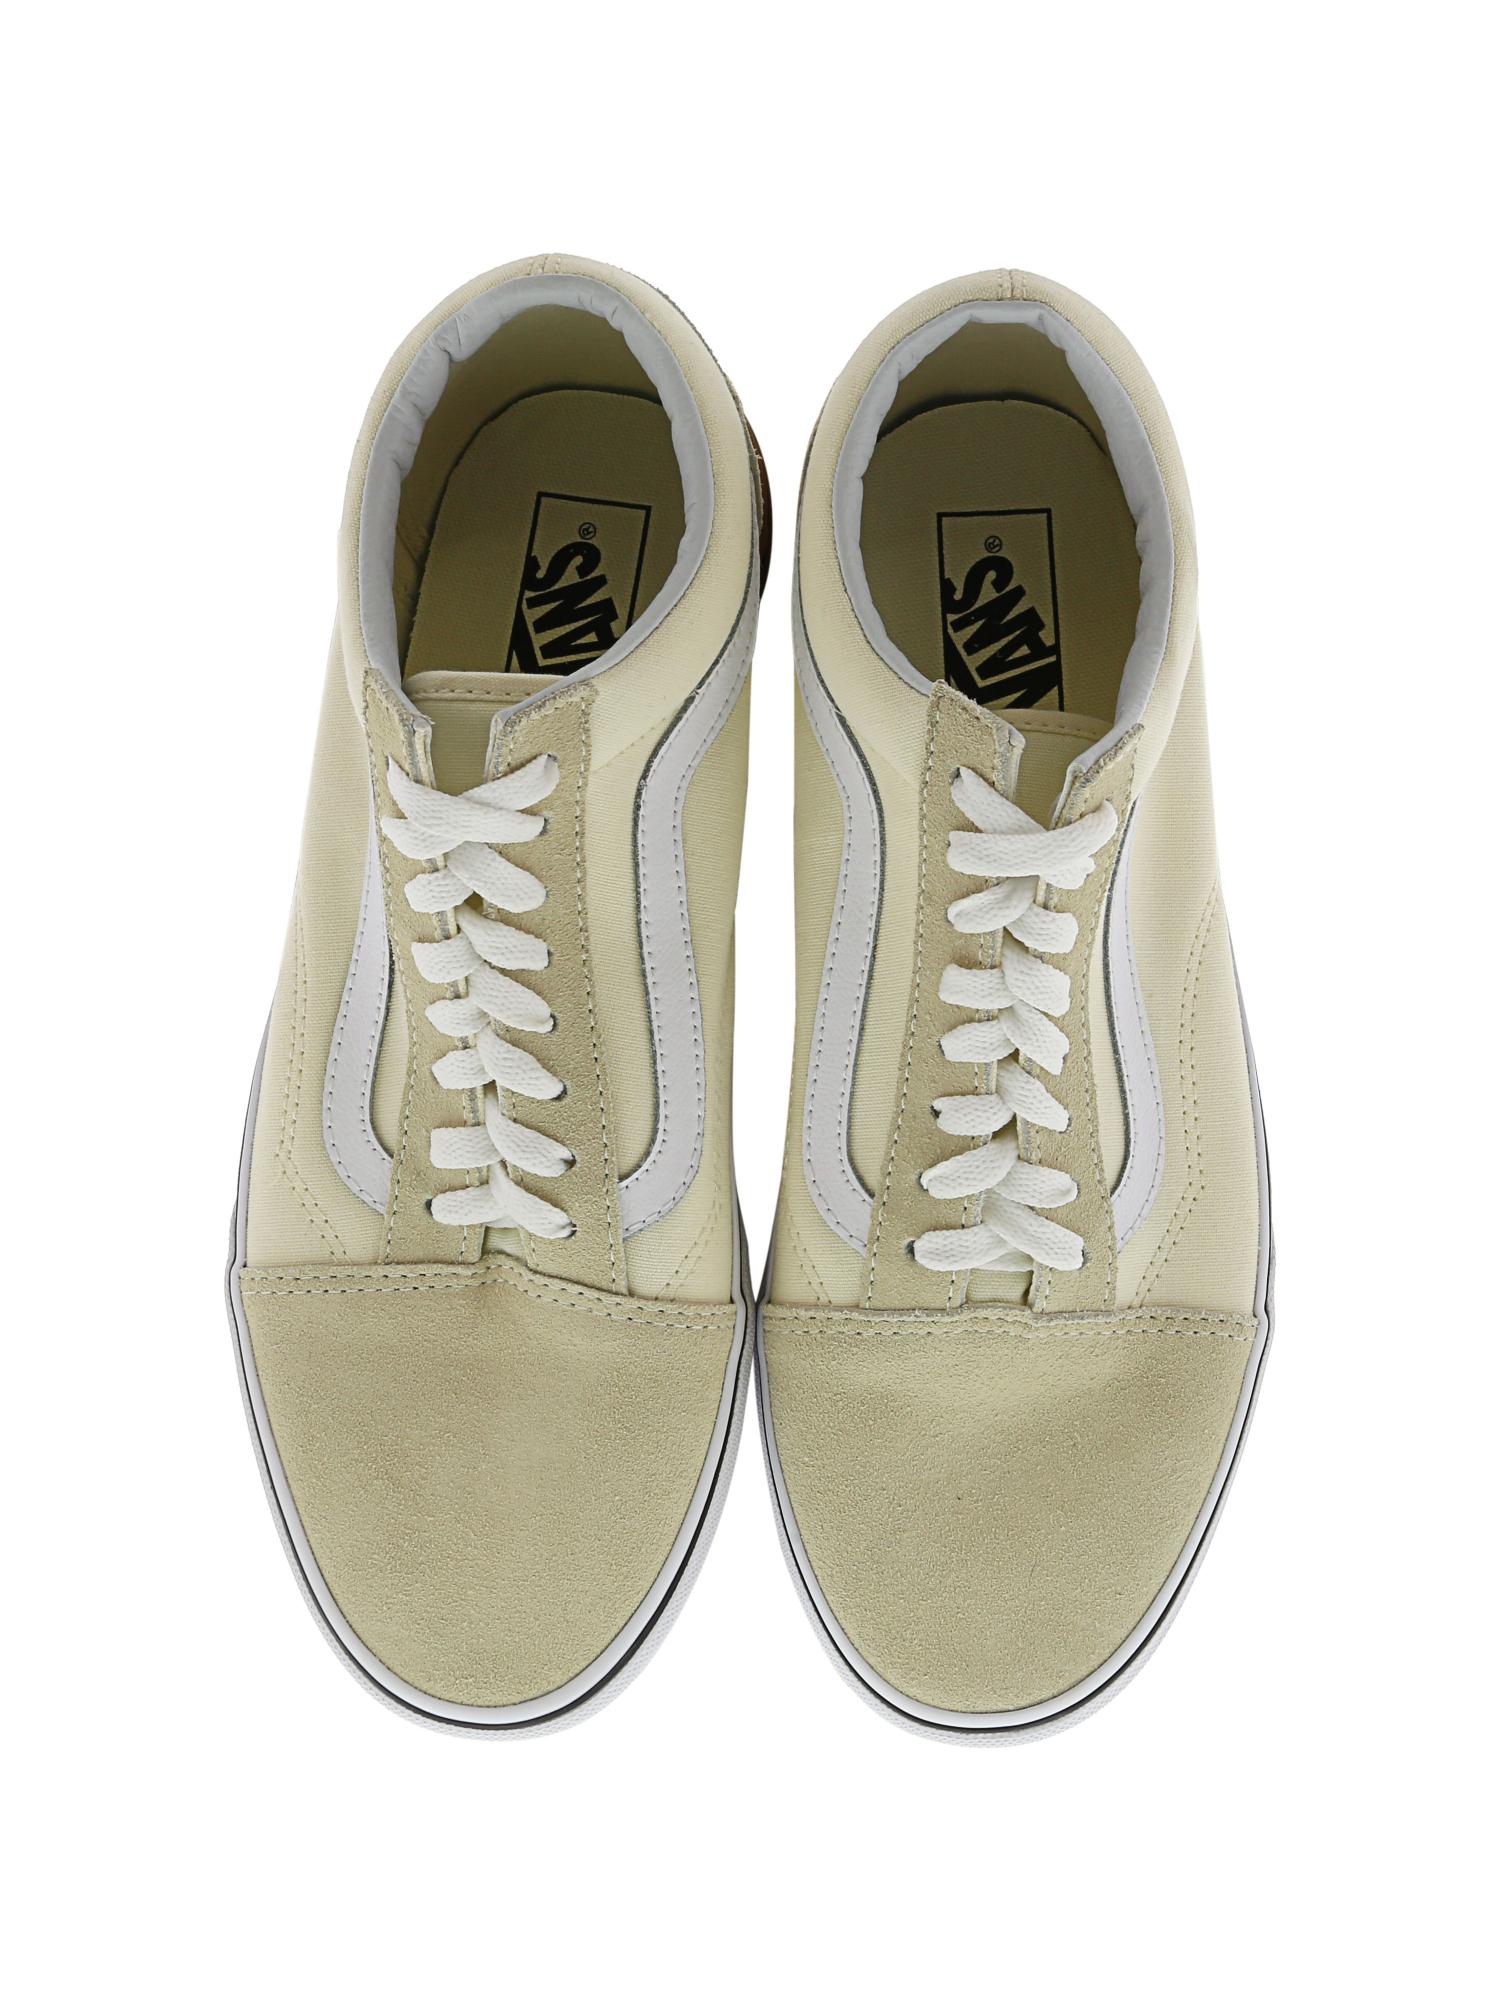 1d41b8f2cde13c ... Picture 2 of 3  Picture 3 of 3. Vans Men s Old Skool Skateboarding Shoe